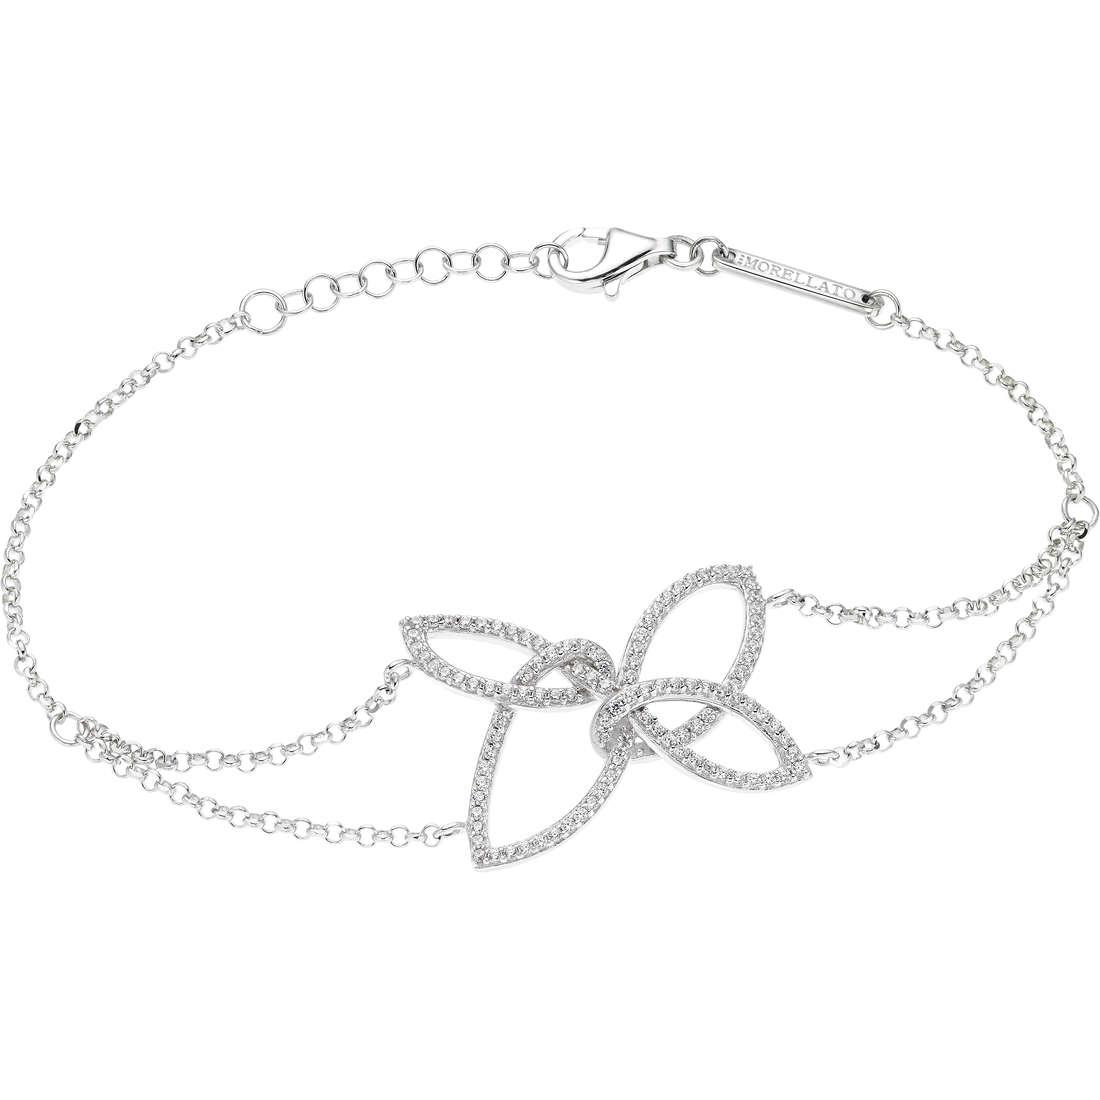 bracelet woman jewellery Morellato 1930 Michelle Hunziker SAHA06